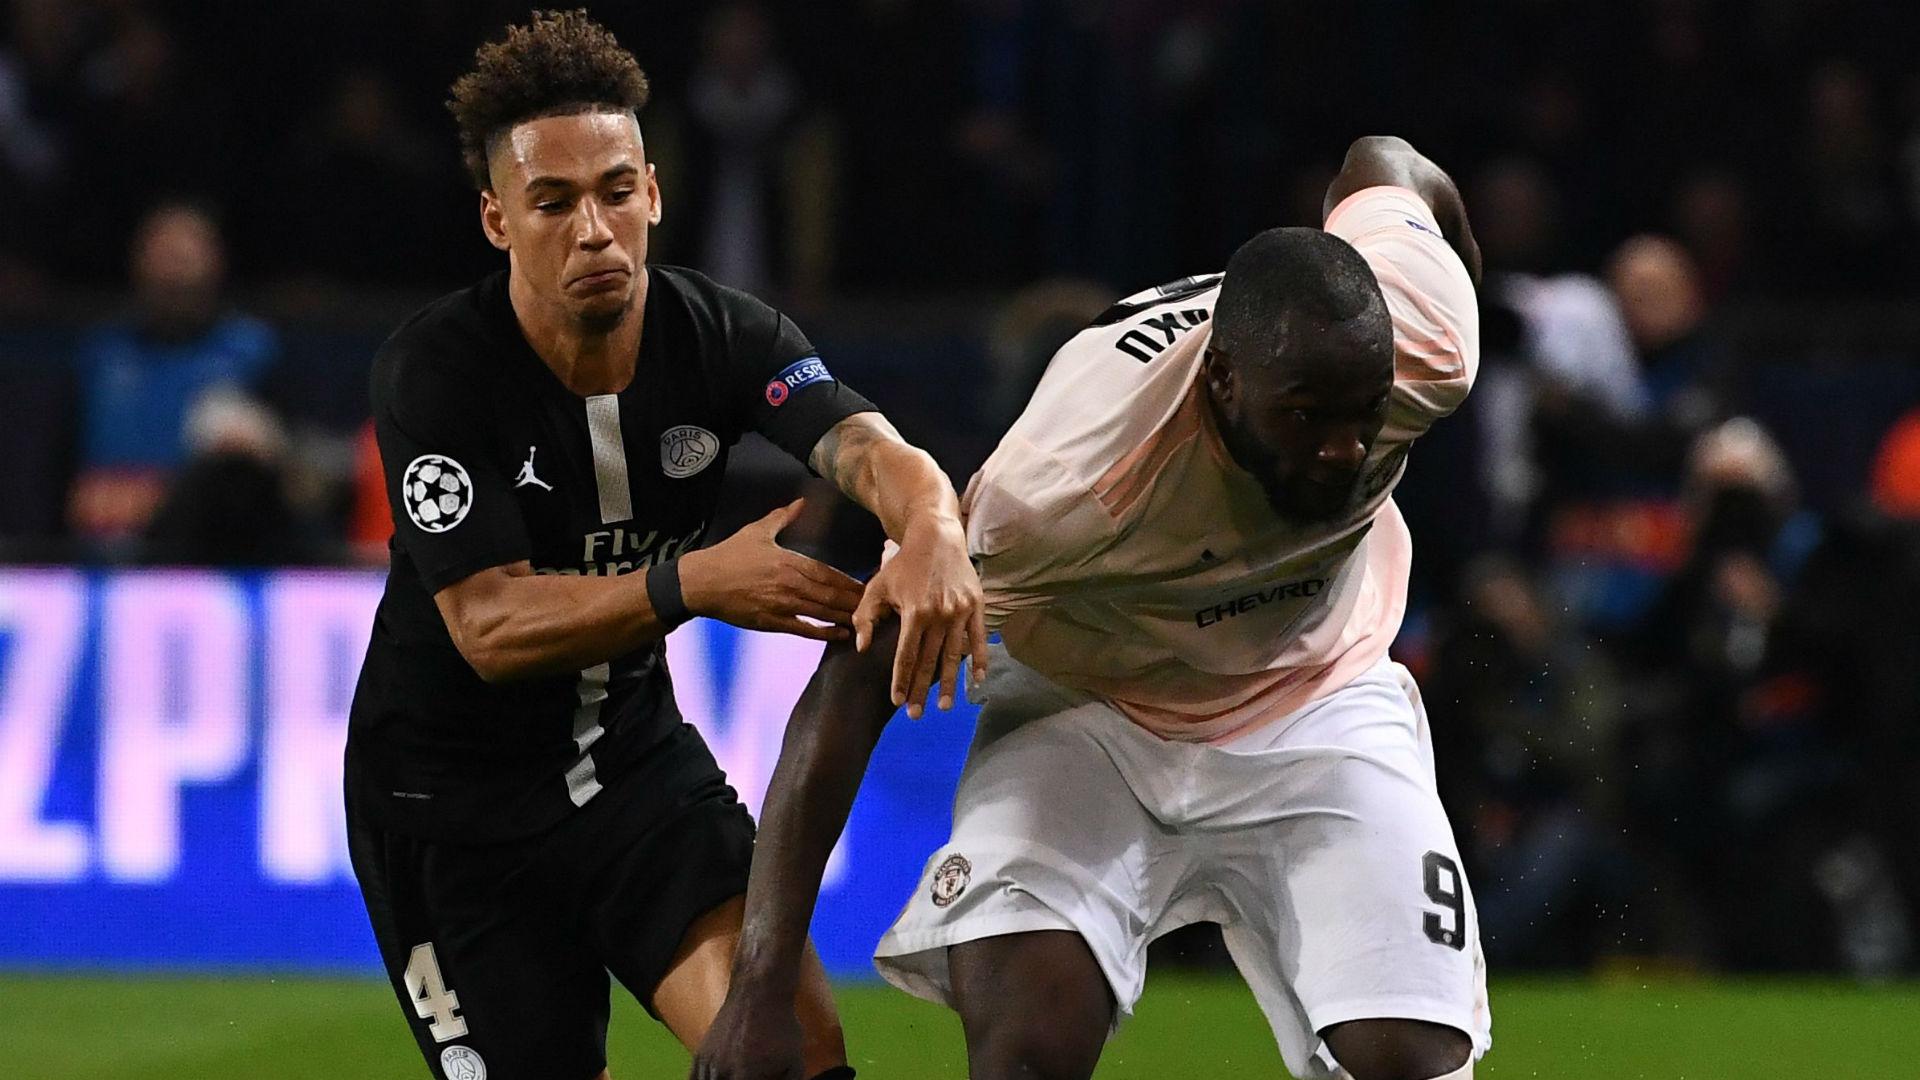 Thilo Kehrer Romelu Lukaku PSG Manchester United UEFA Champions League 06032019